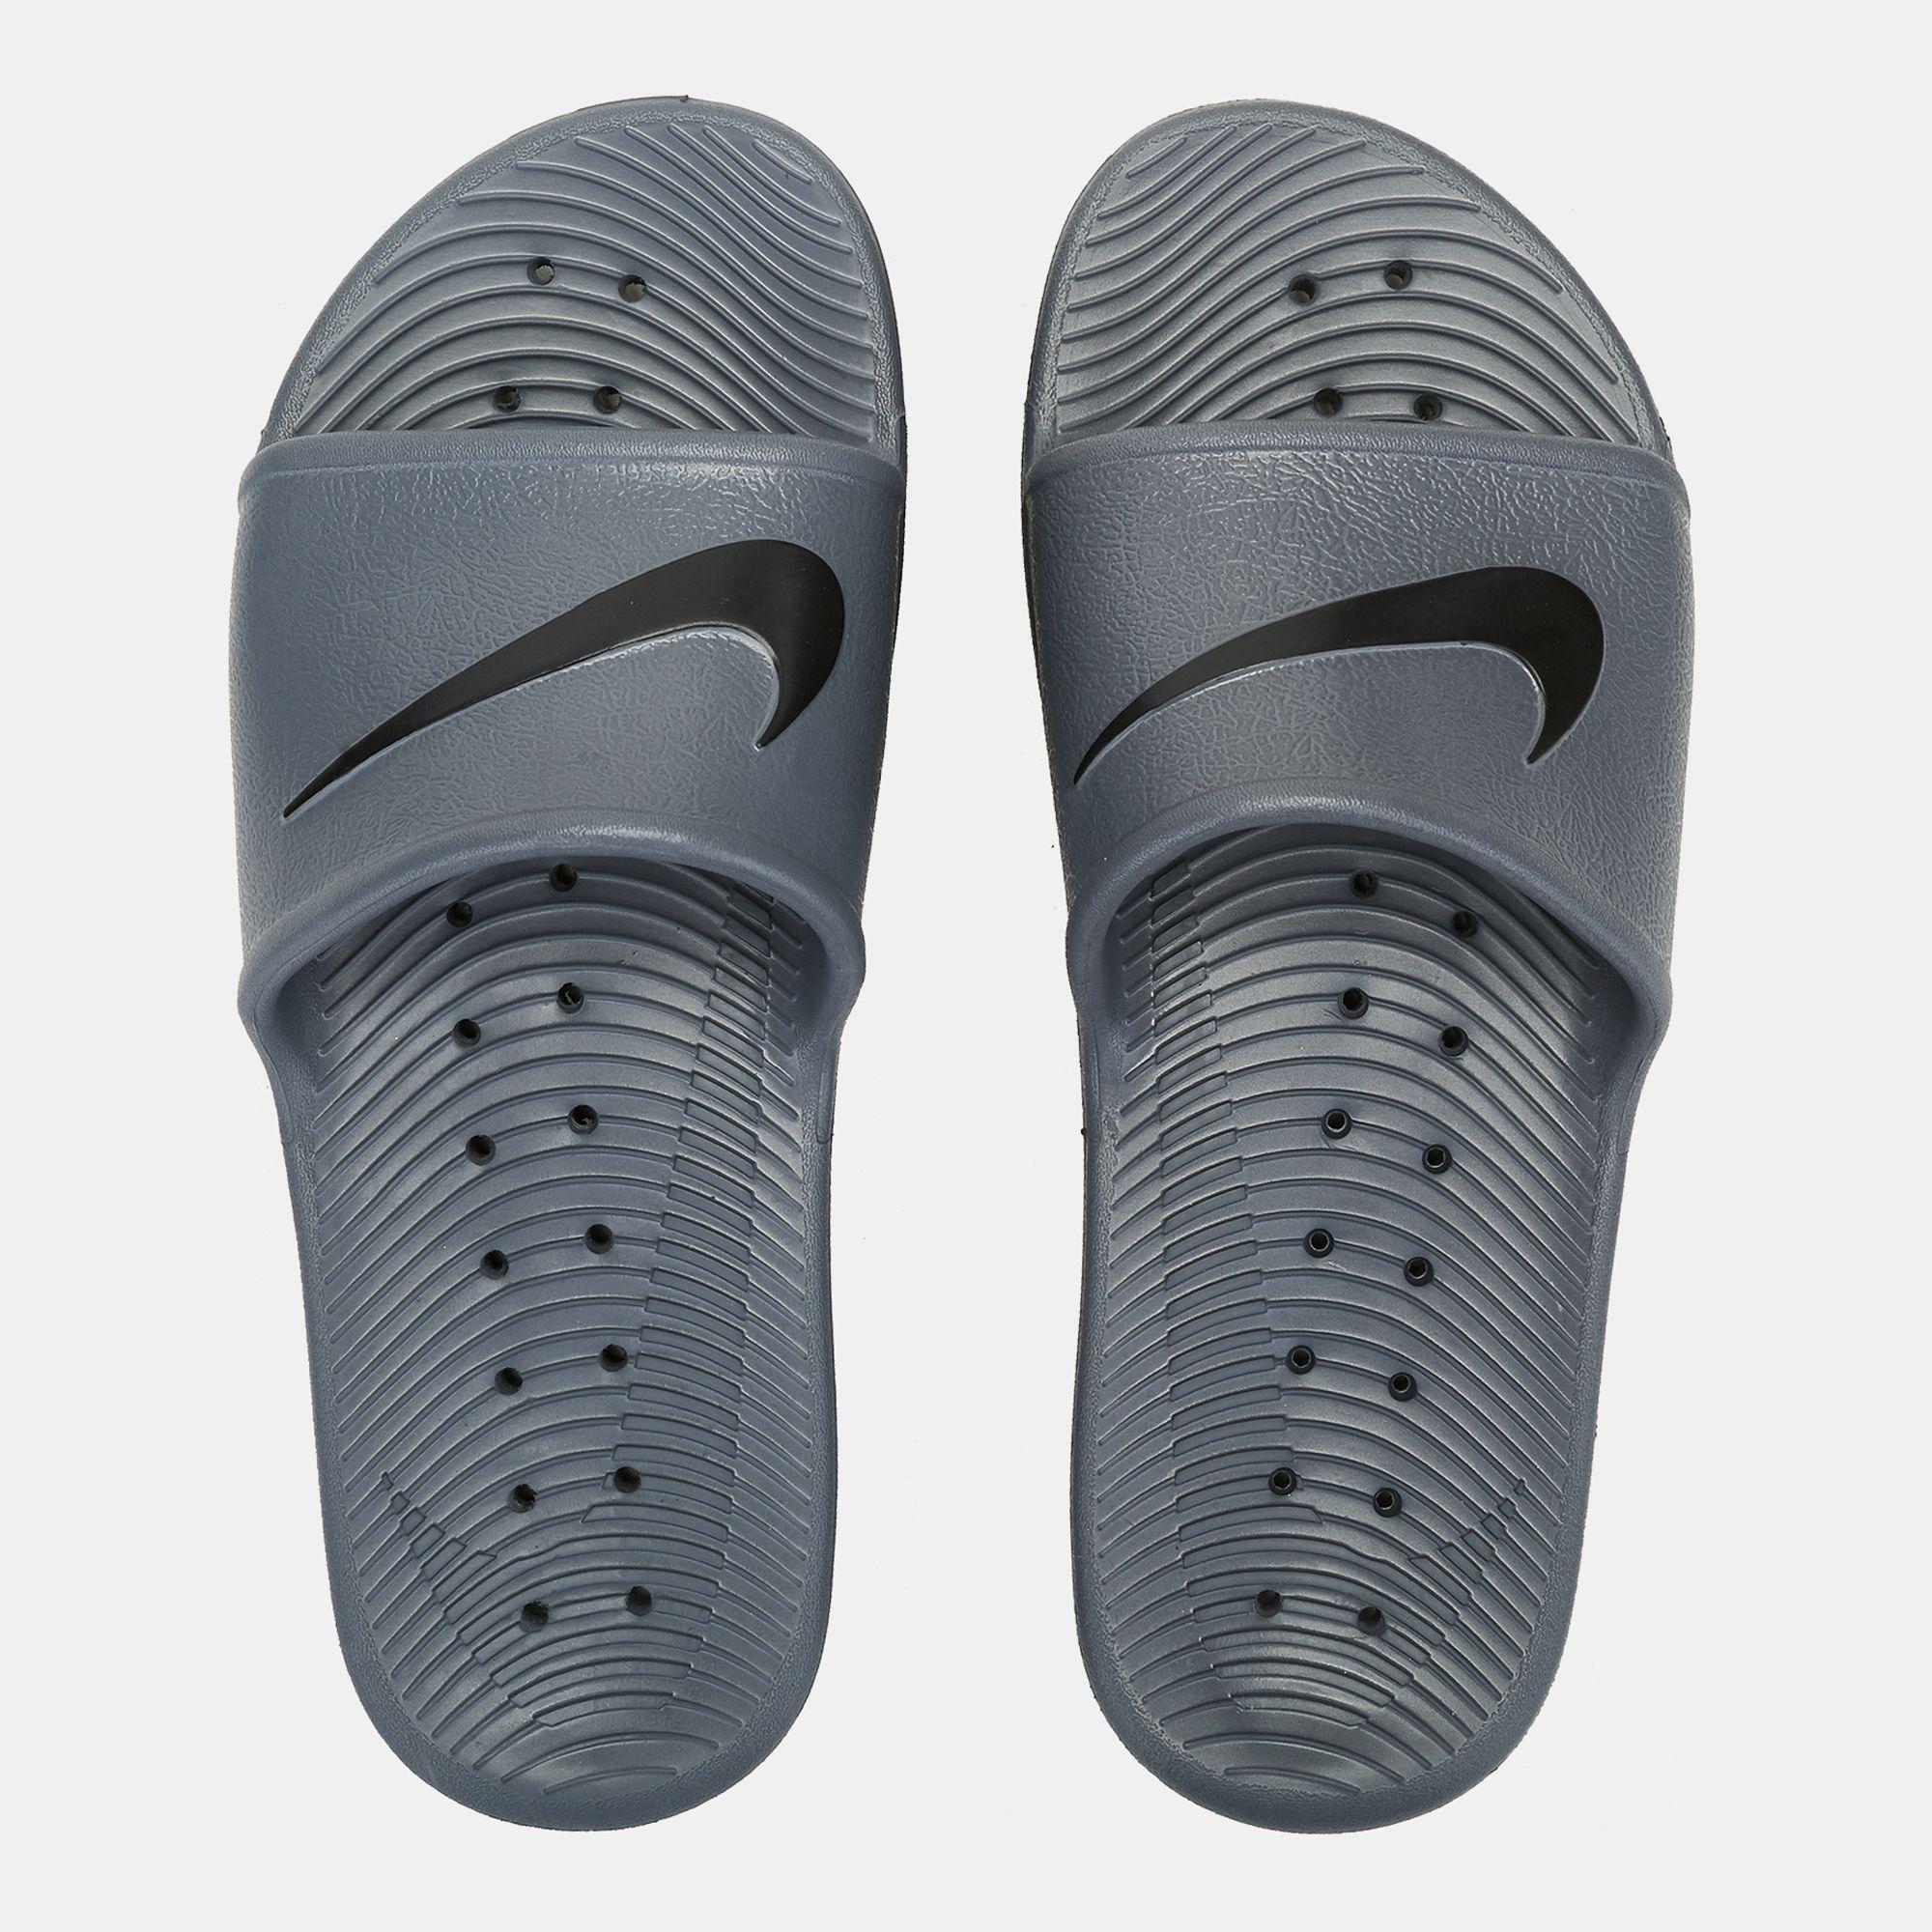 27486365c902f7 Nike Kawa Shower Slides